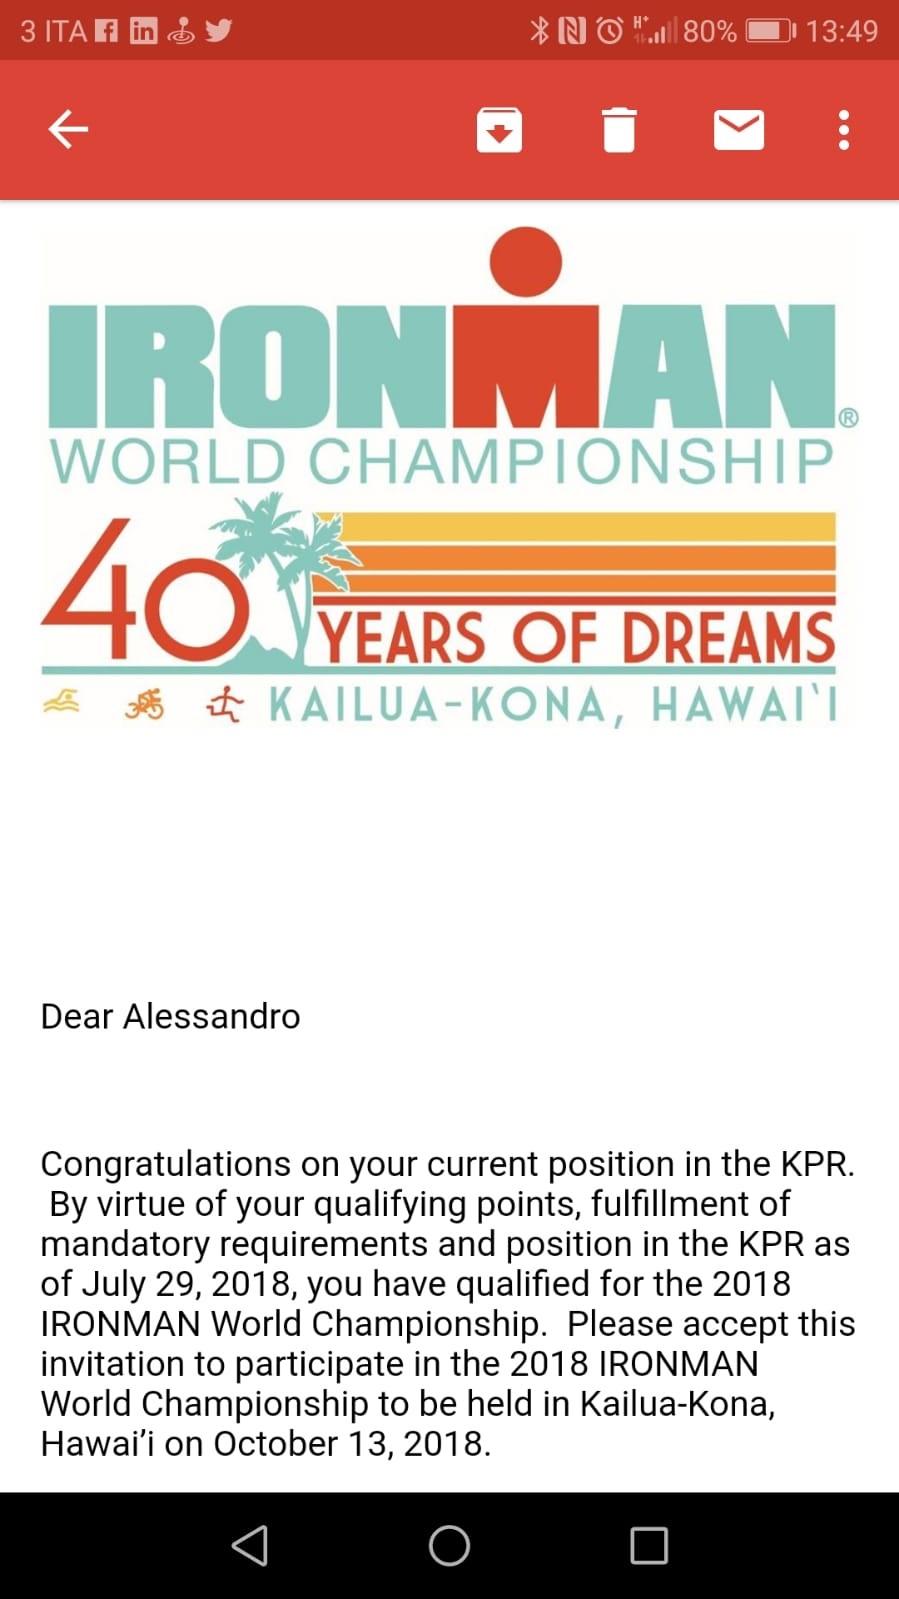 Alessandro Degasperi | Ironman World Championship | Kaliua Kona